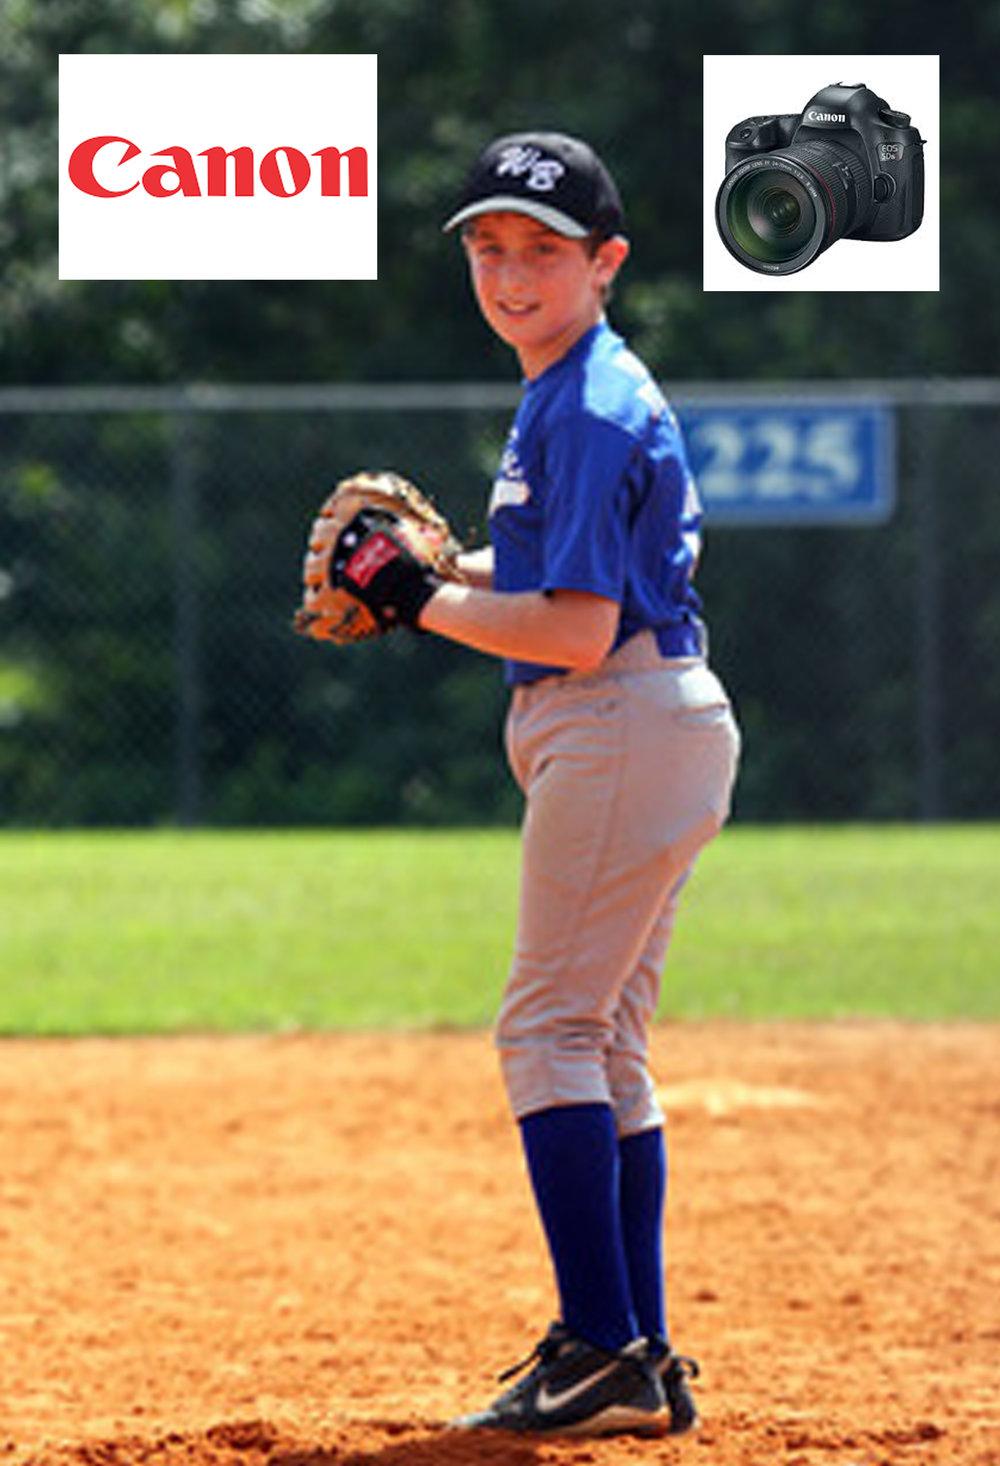 Canon Camera USA licenses Little League Pitcher